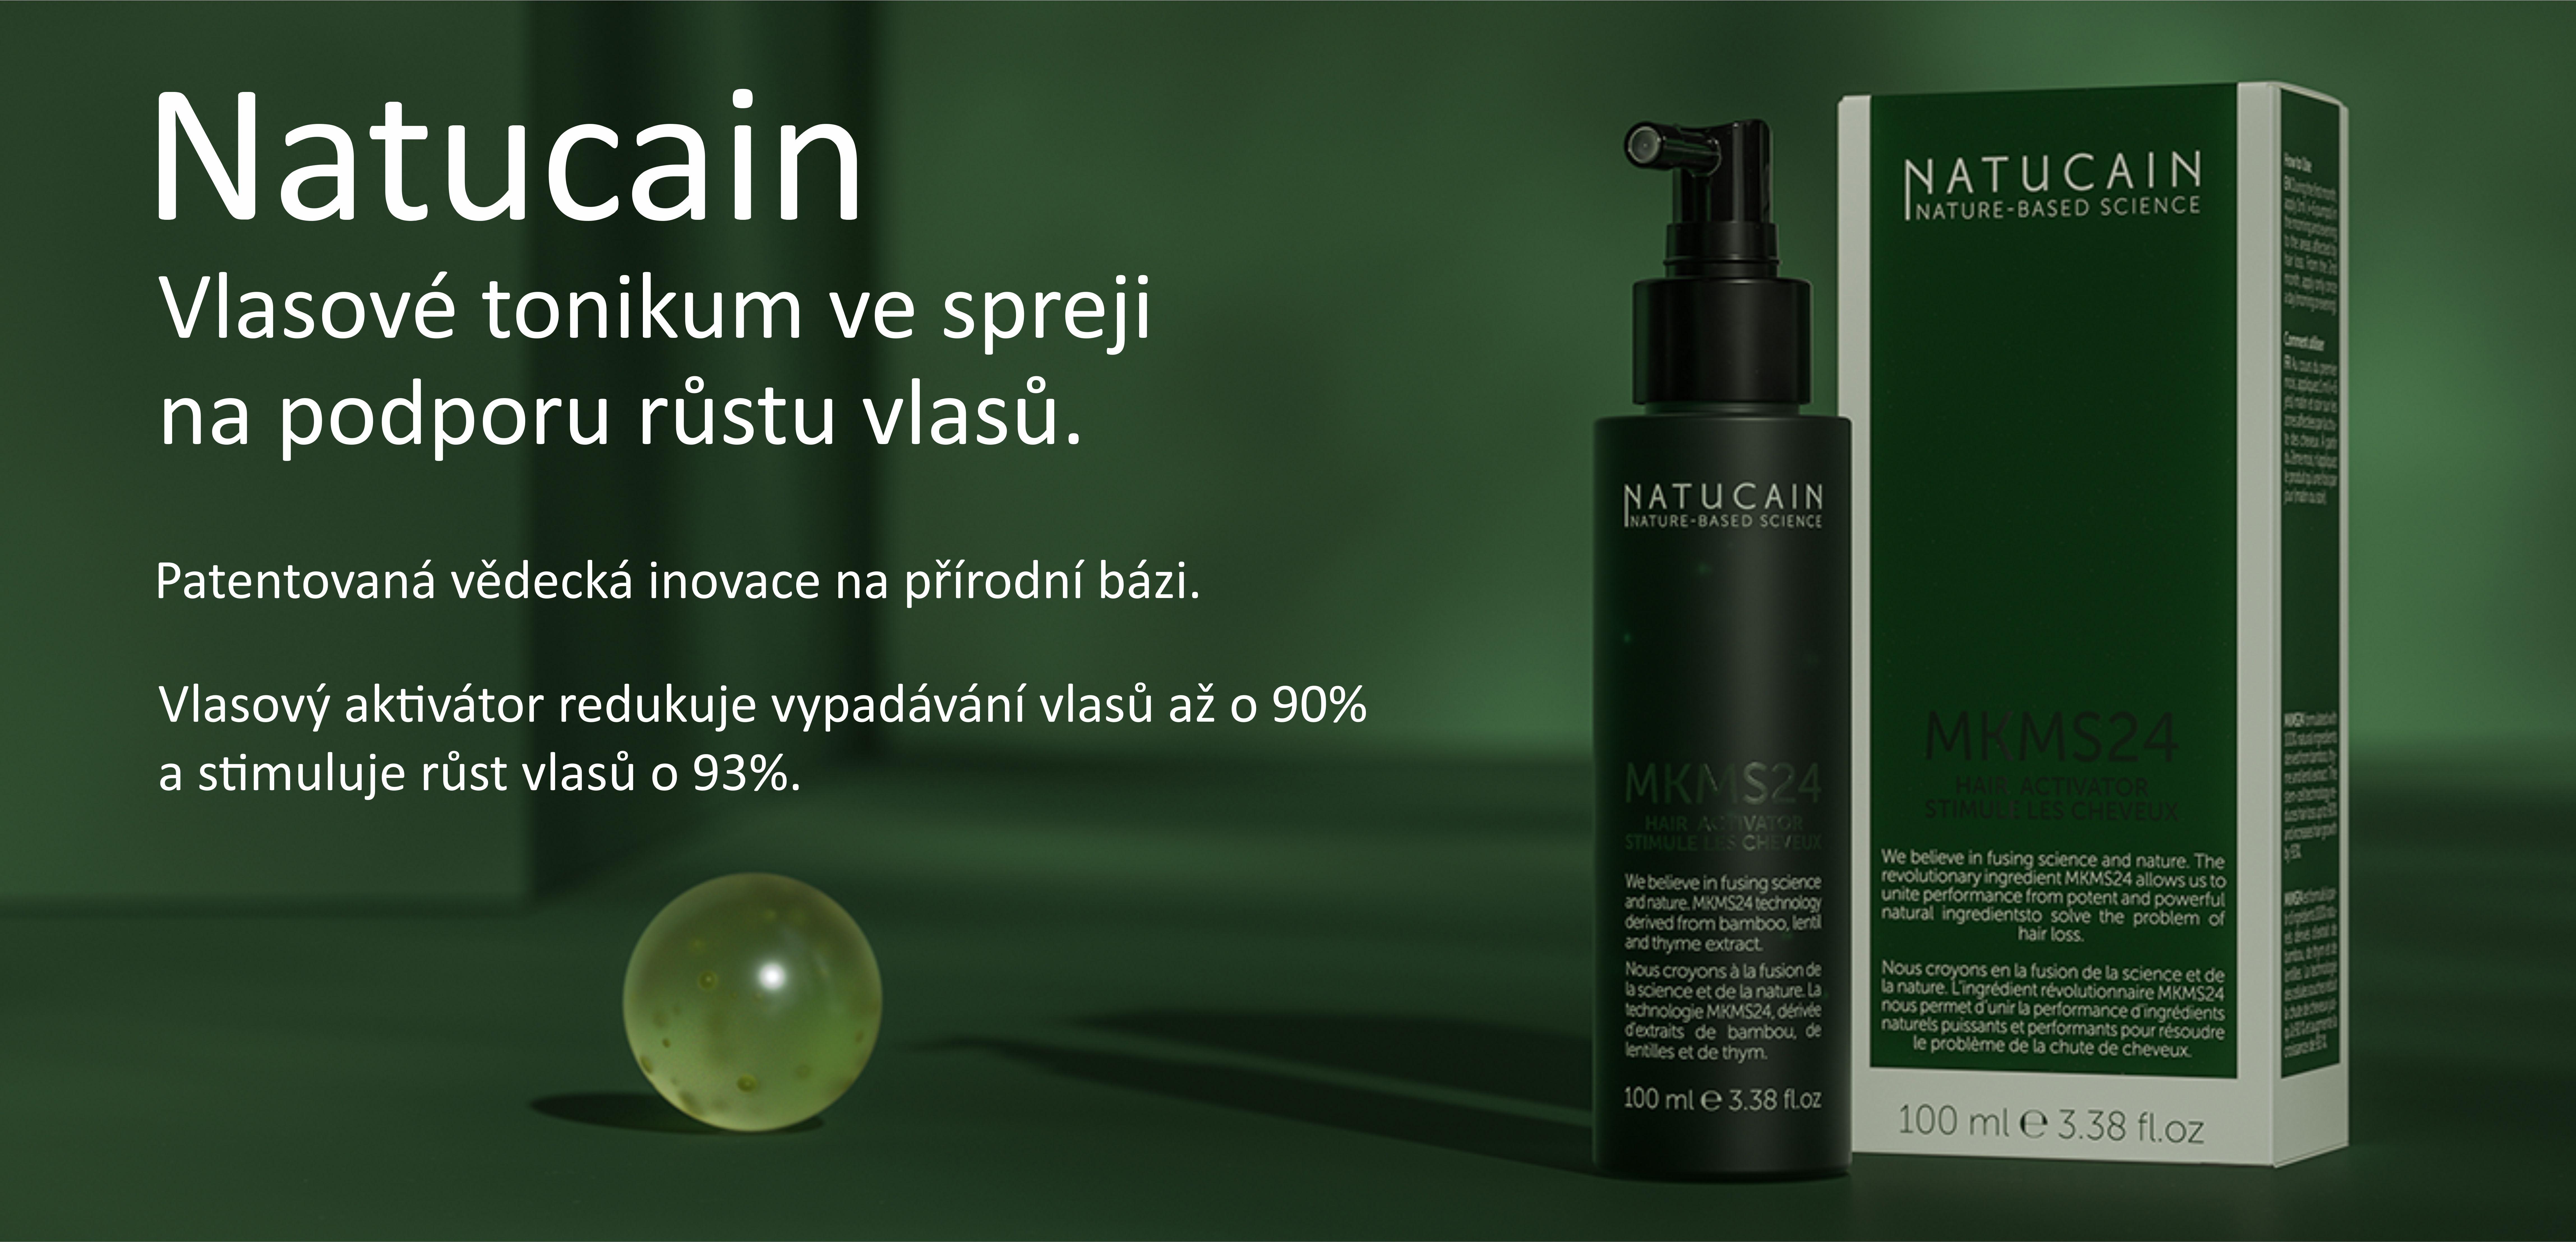 Natucian